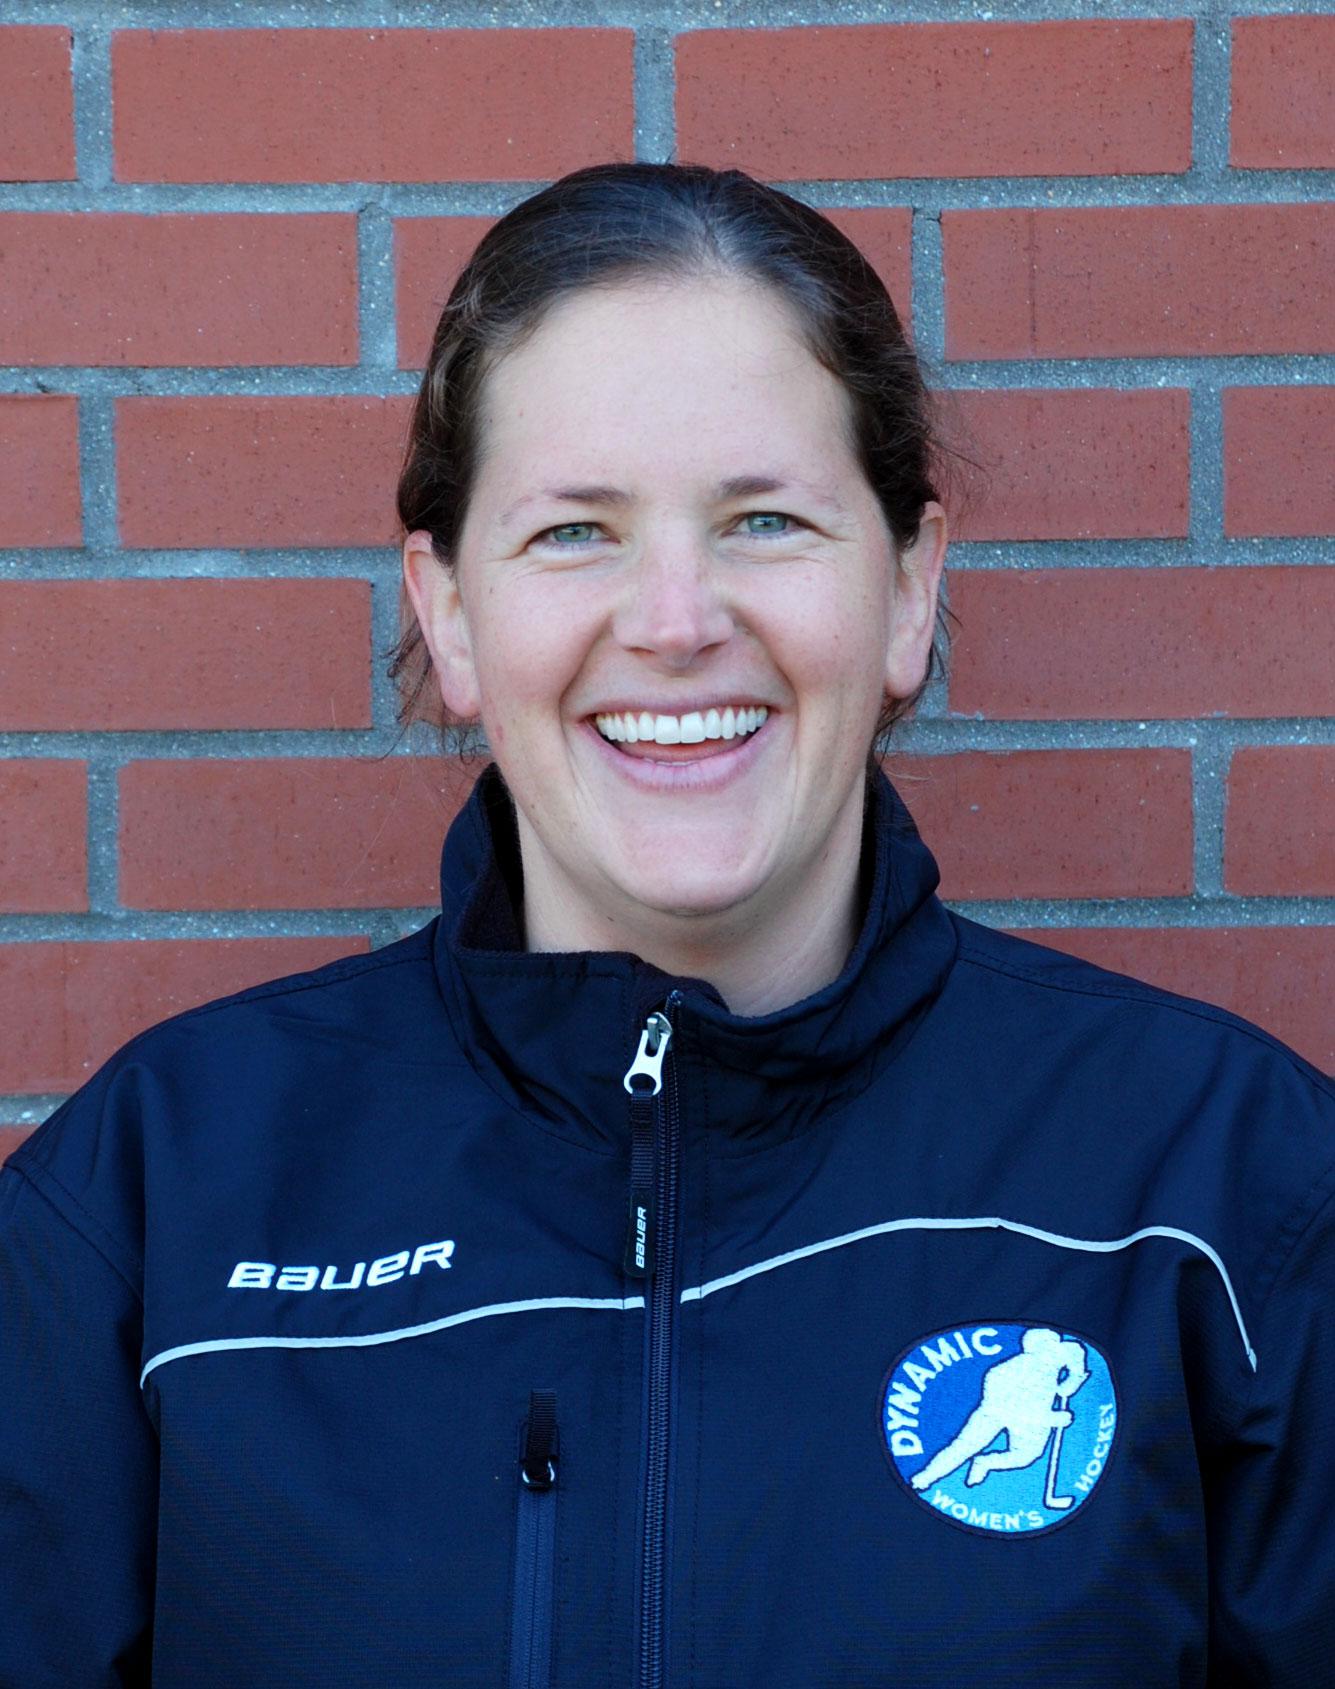 Coach_Mallory.jpg